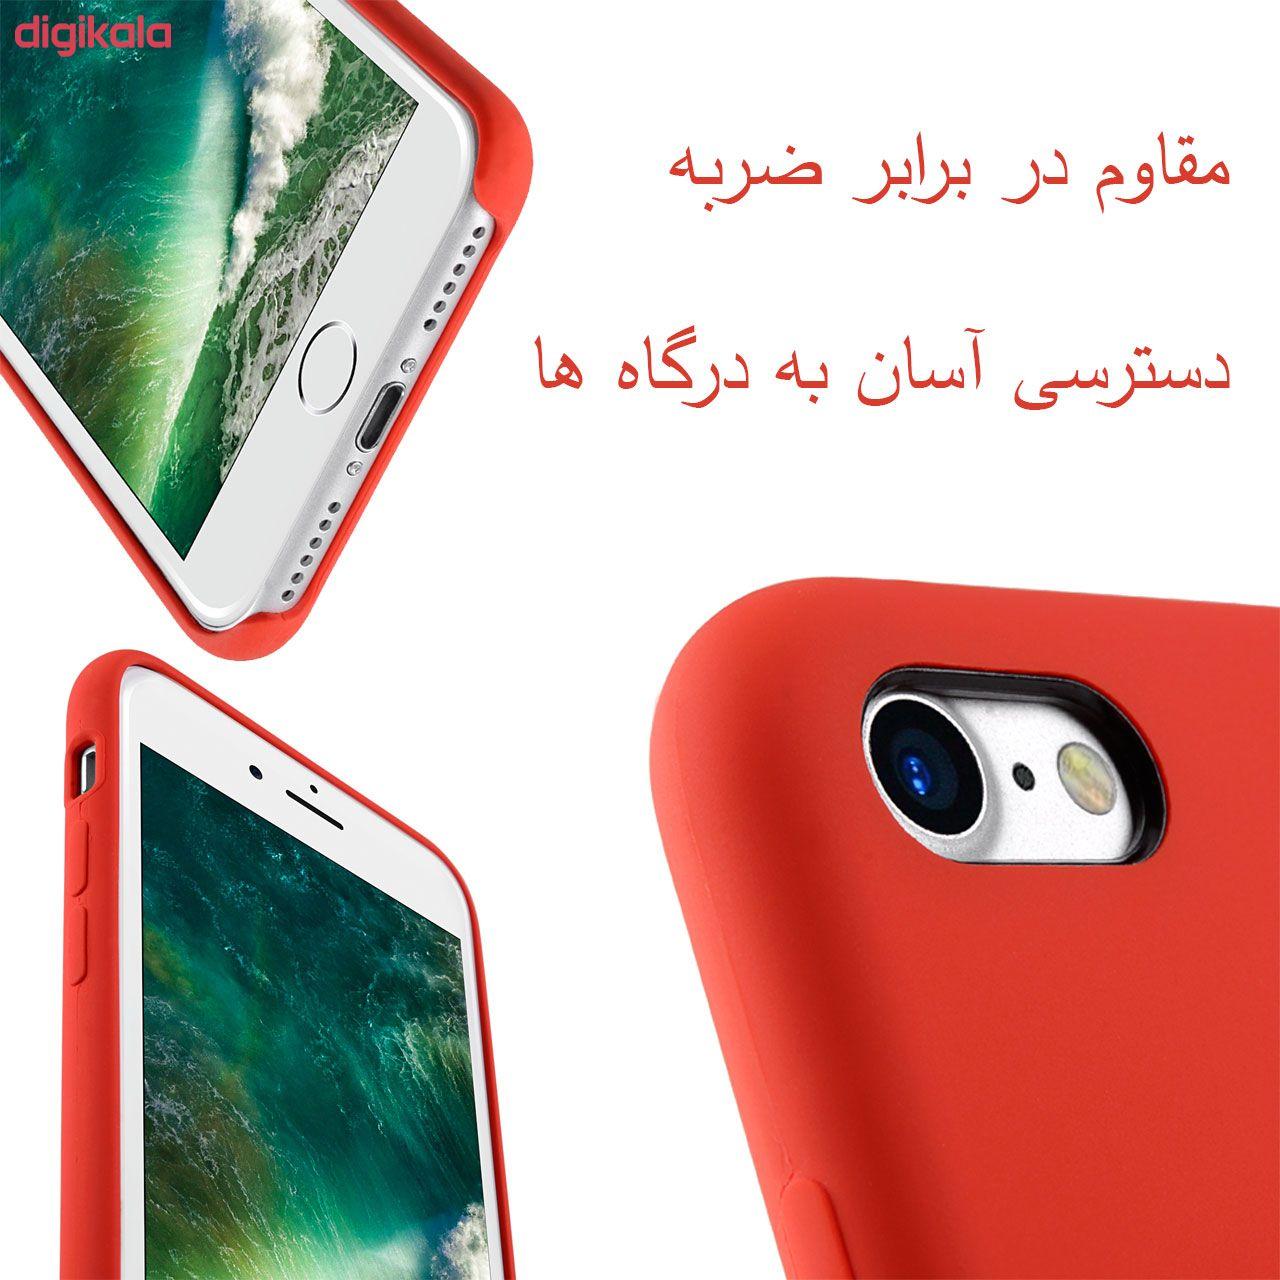 کاور مدل SLCN مناسب برای گوشی موبایل اپل iPhone 7 main 1 1